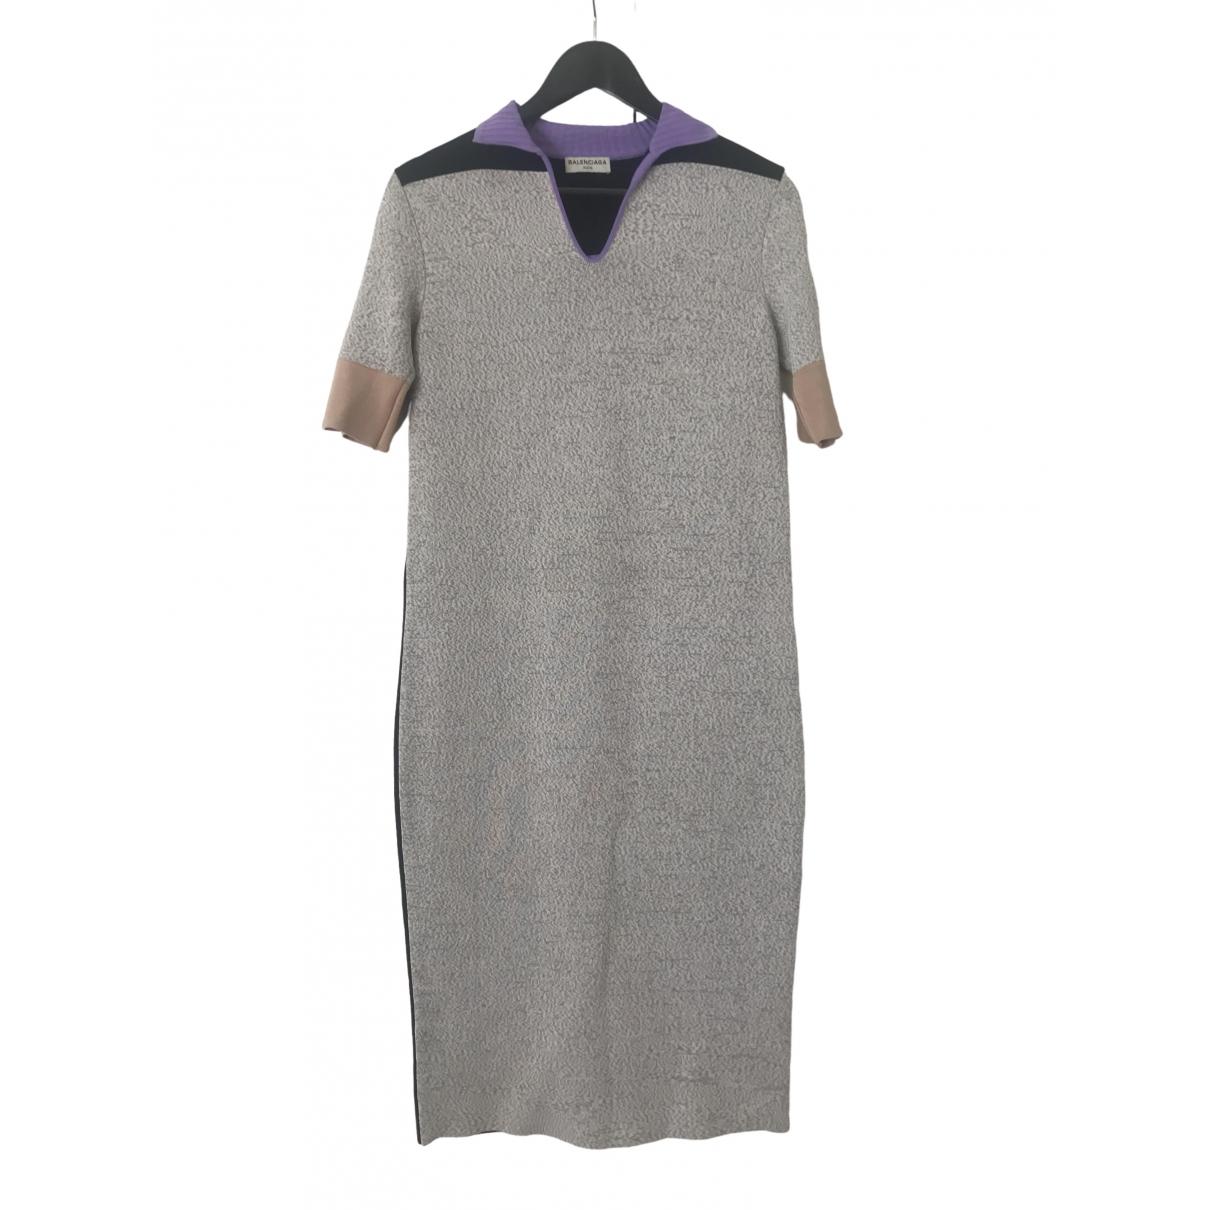 Balenciaga \N Kleid in  Anthrazit Polyester